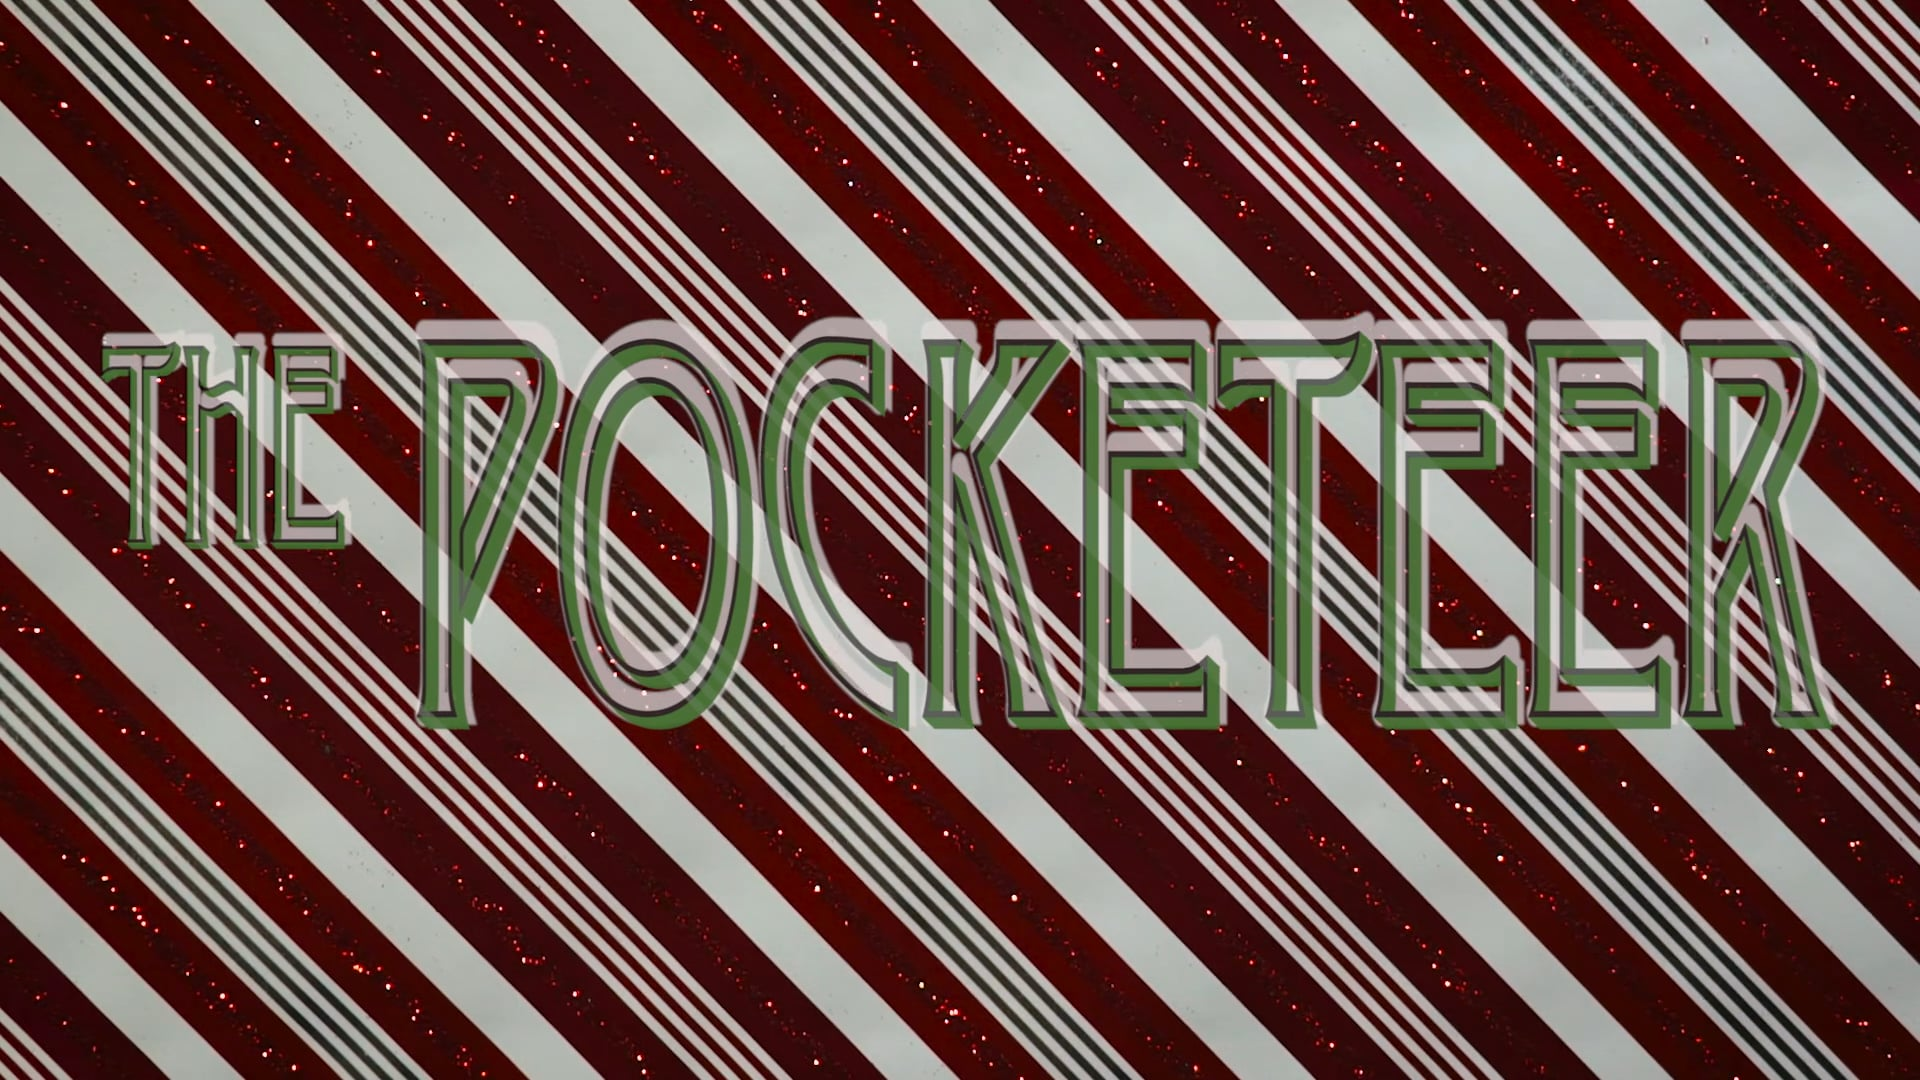 The Pocketeer   Poem by Todd Boss   Film by Jimmy Gildea & Elizabeth Turner